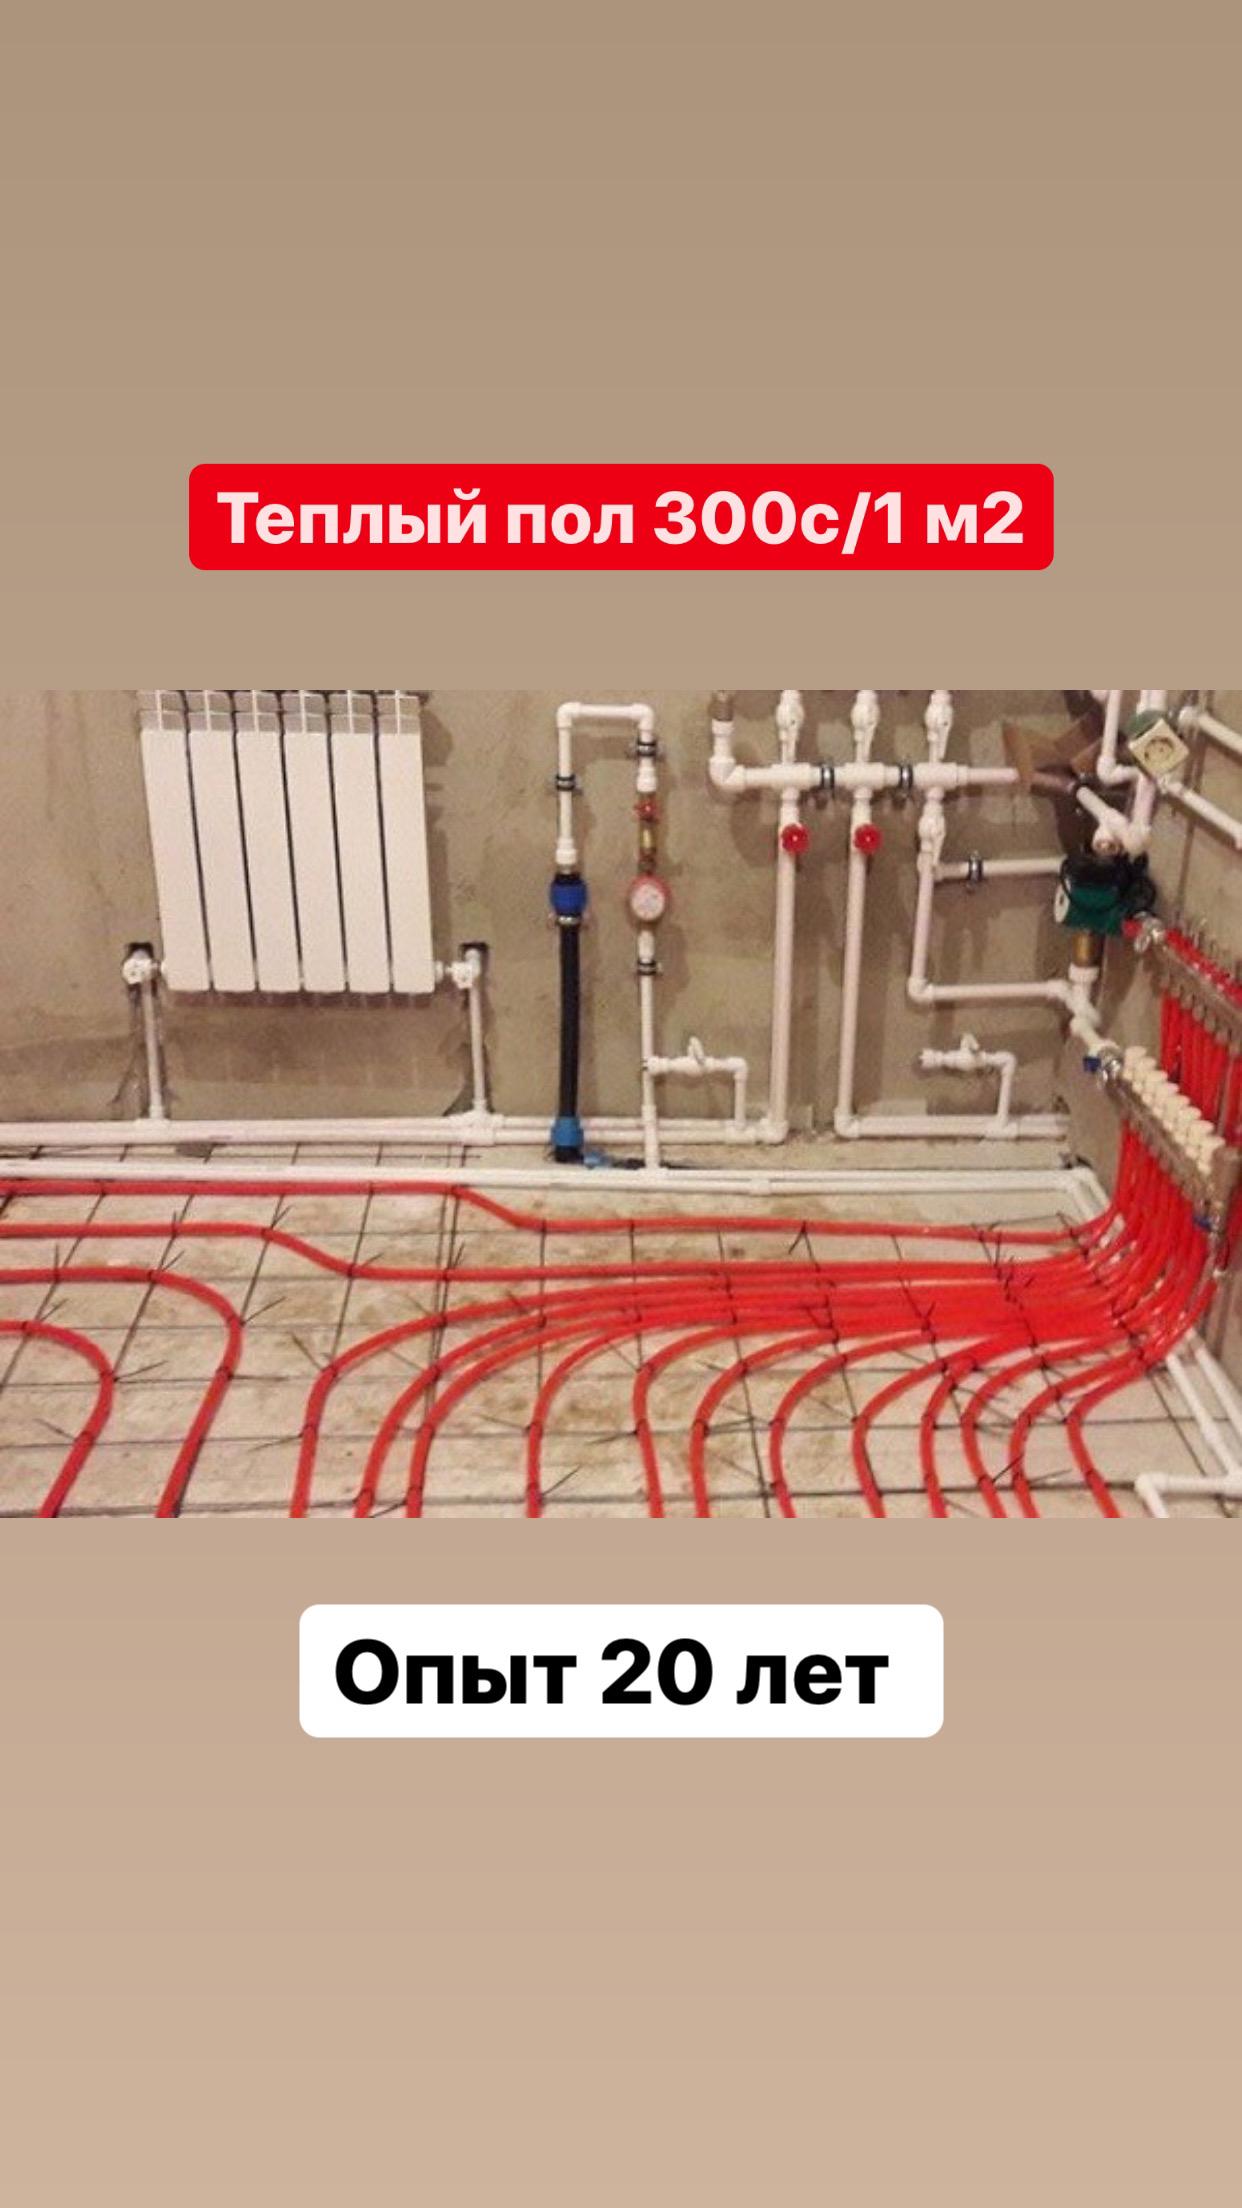 Теплый пол 300/м2